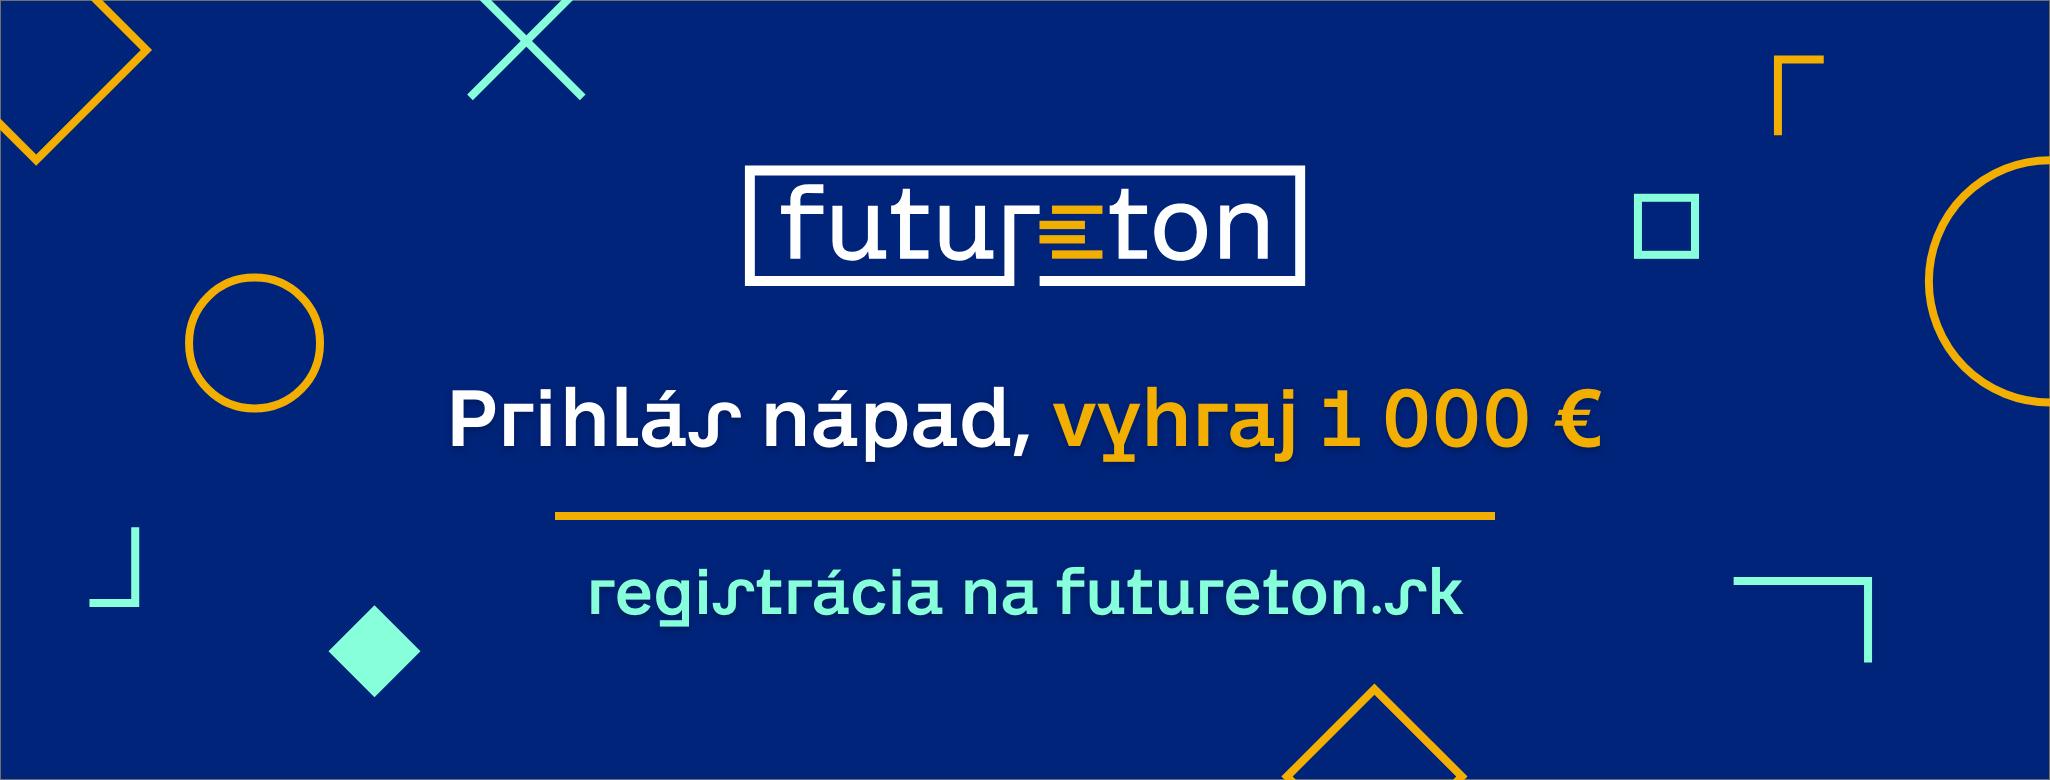 Futureton banner